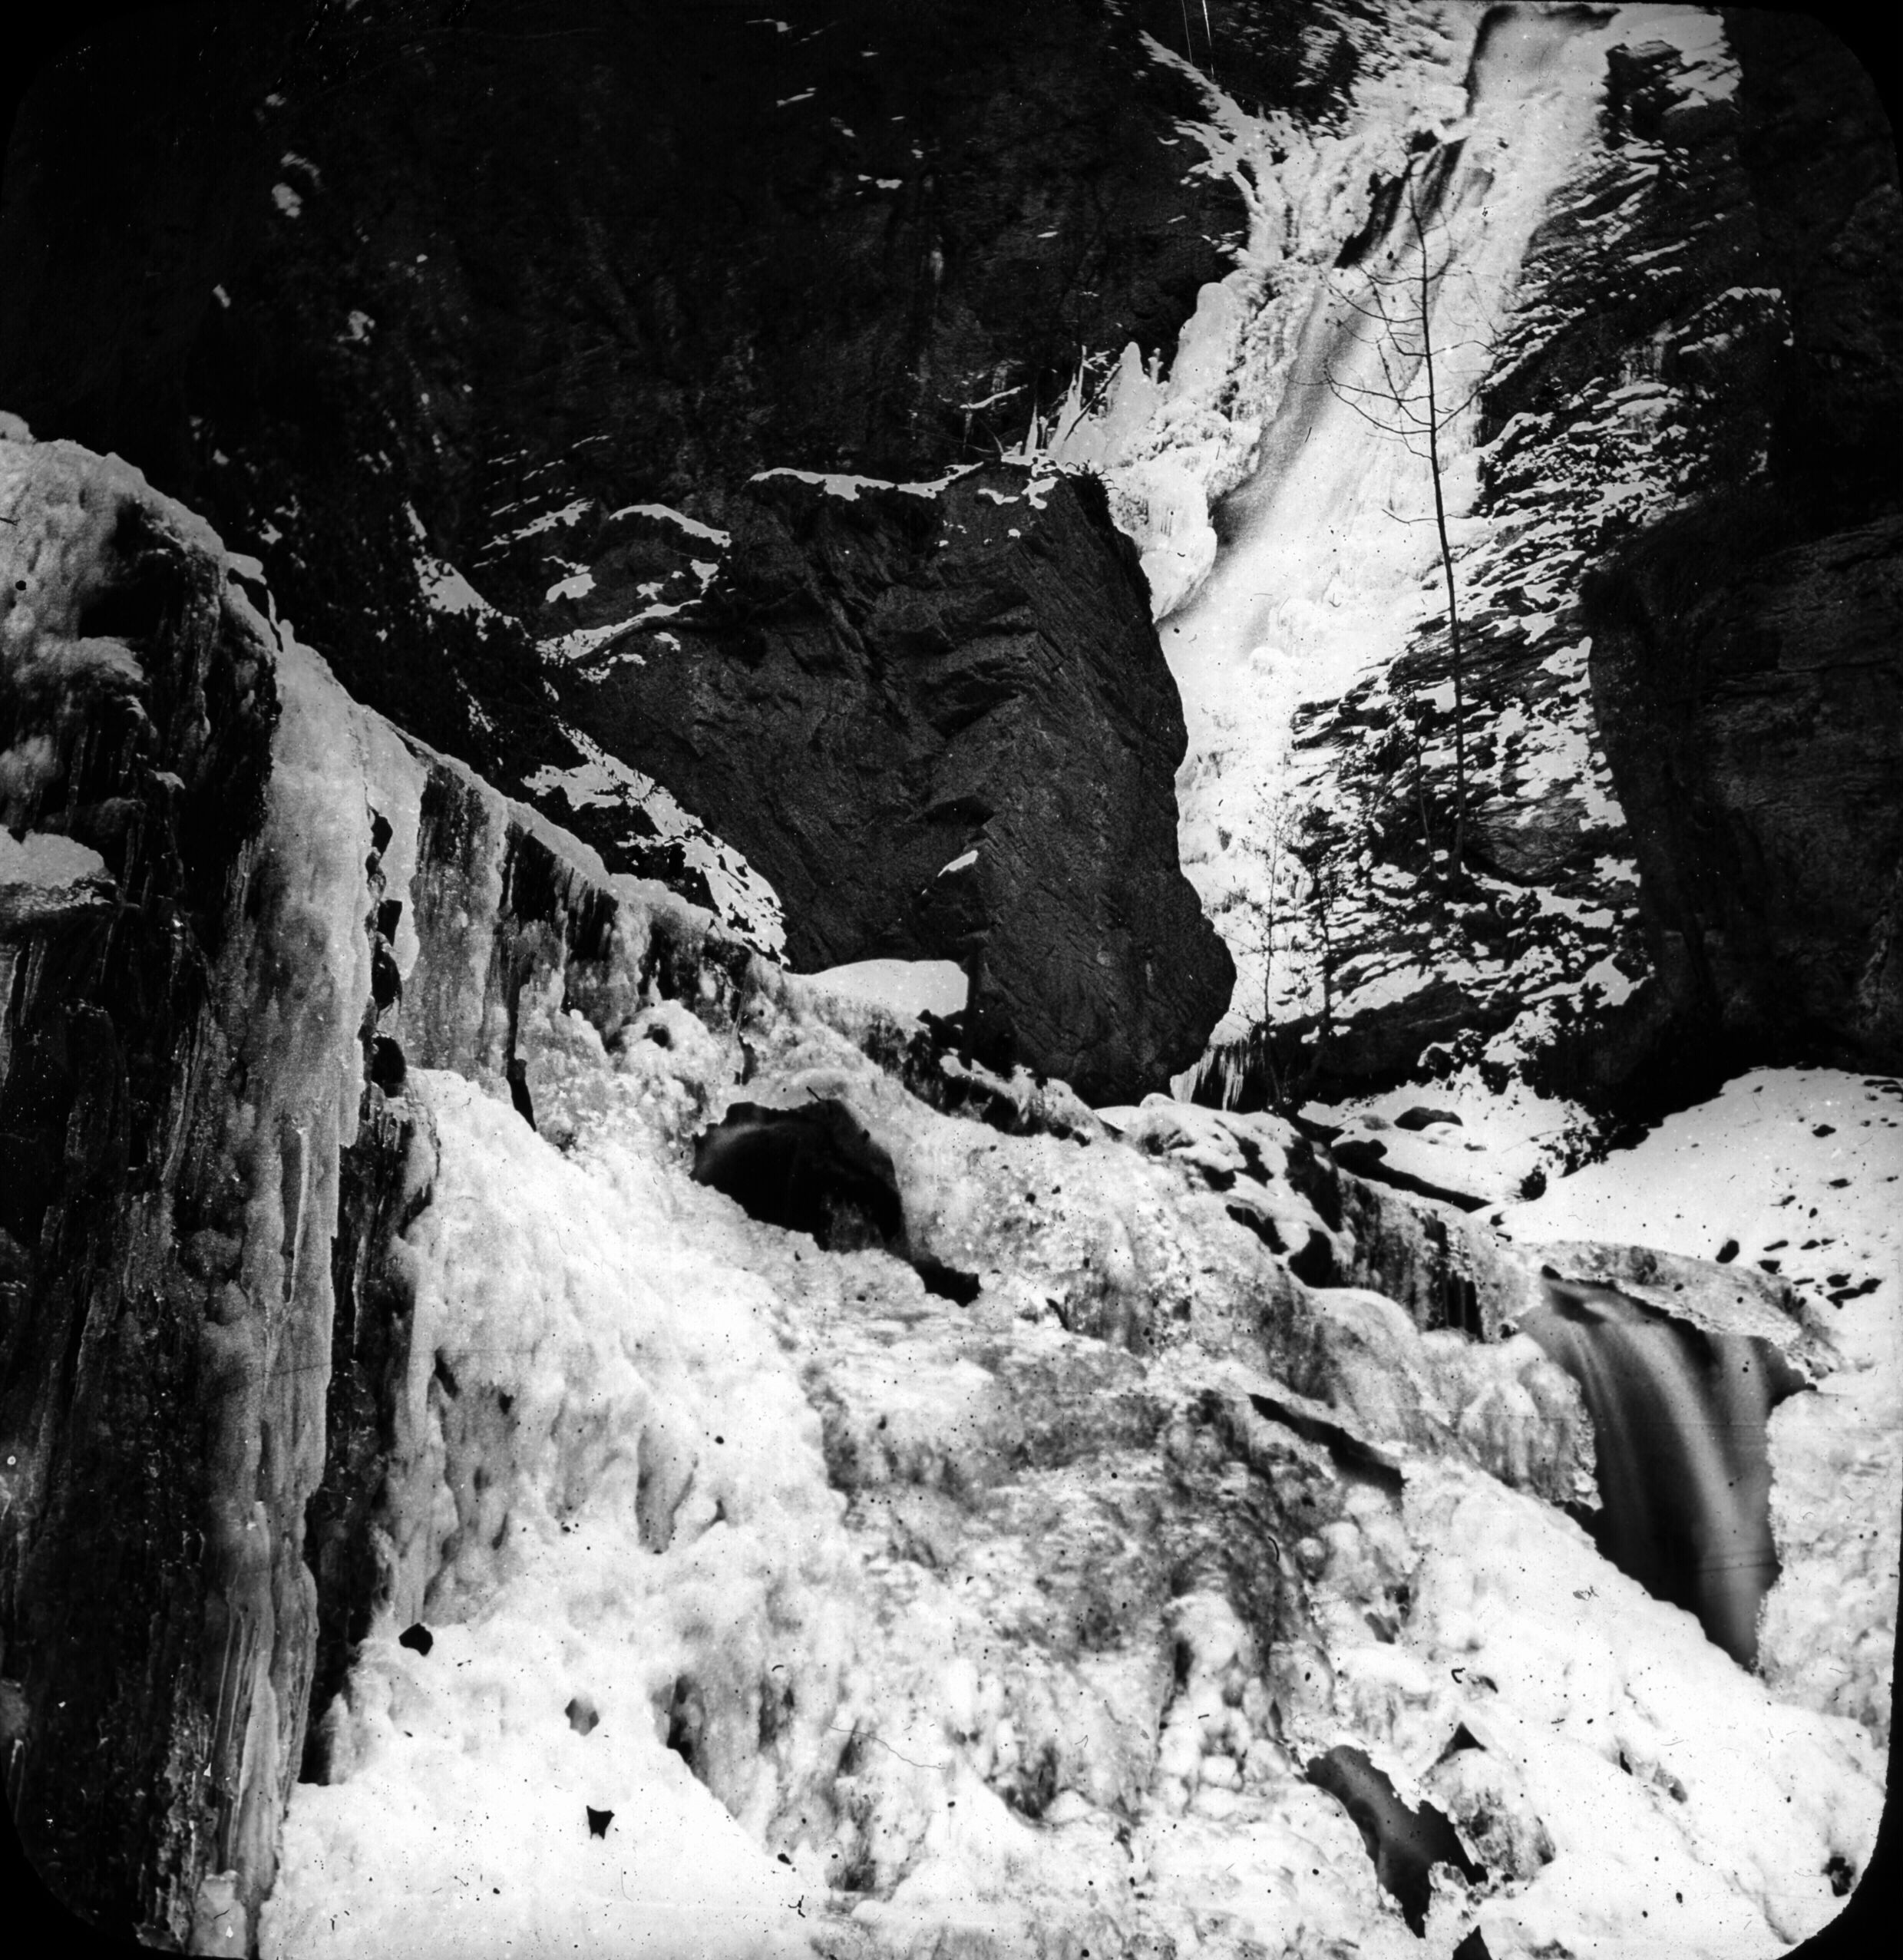 Cascade de Juzet en hiver, Luchon [environs]